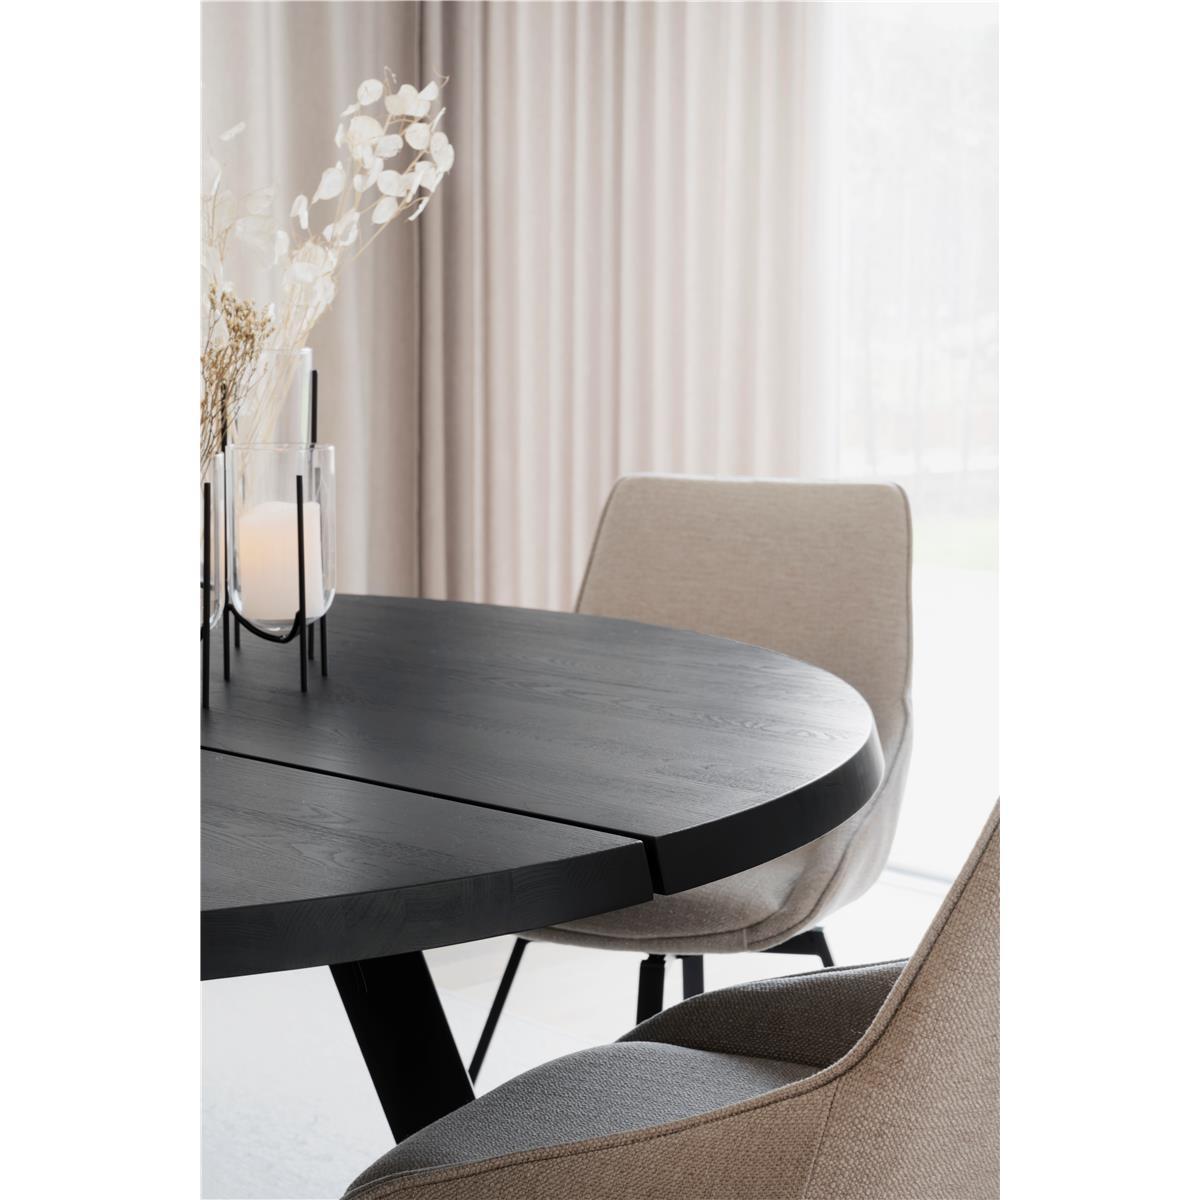 Fred-matbord-svart 117444 1